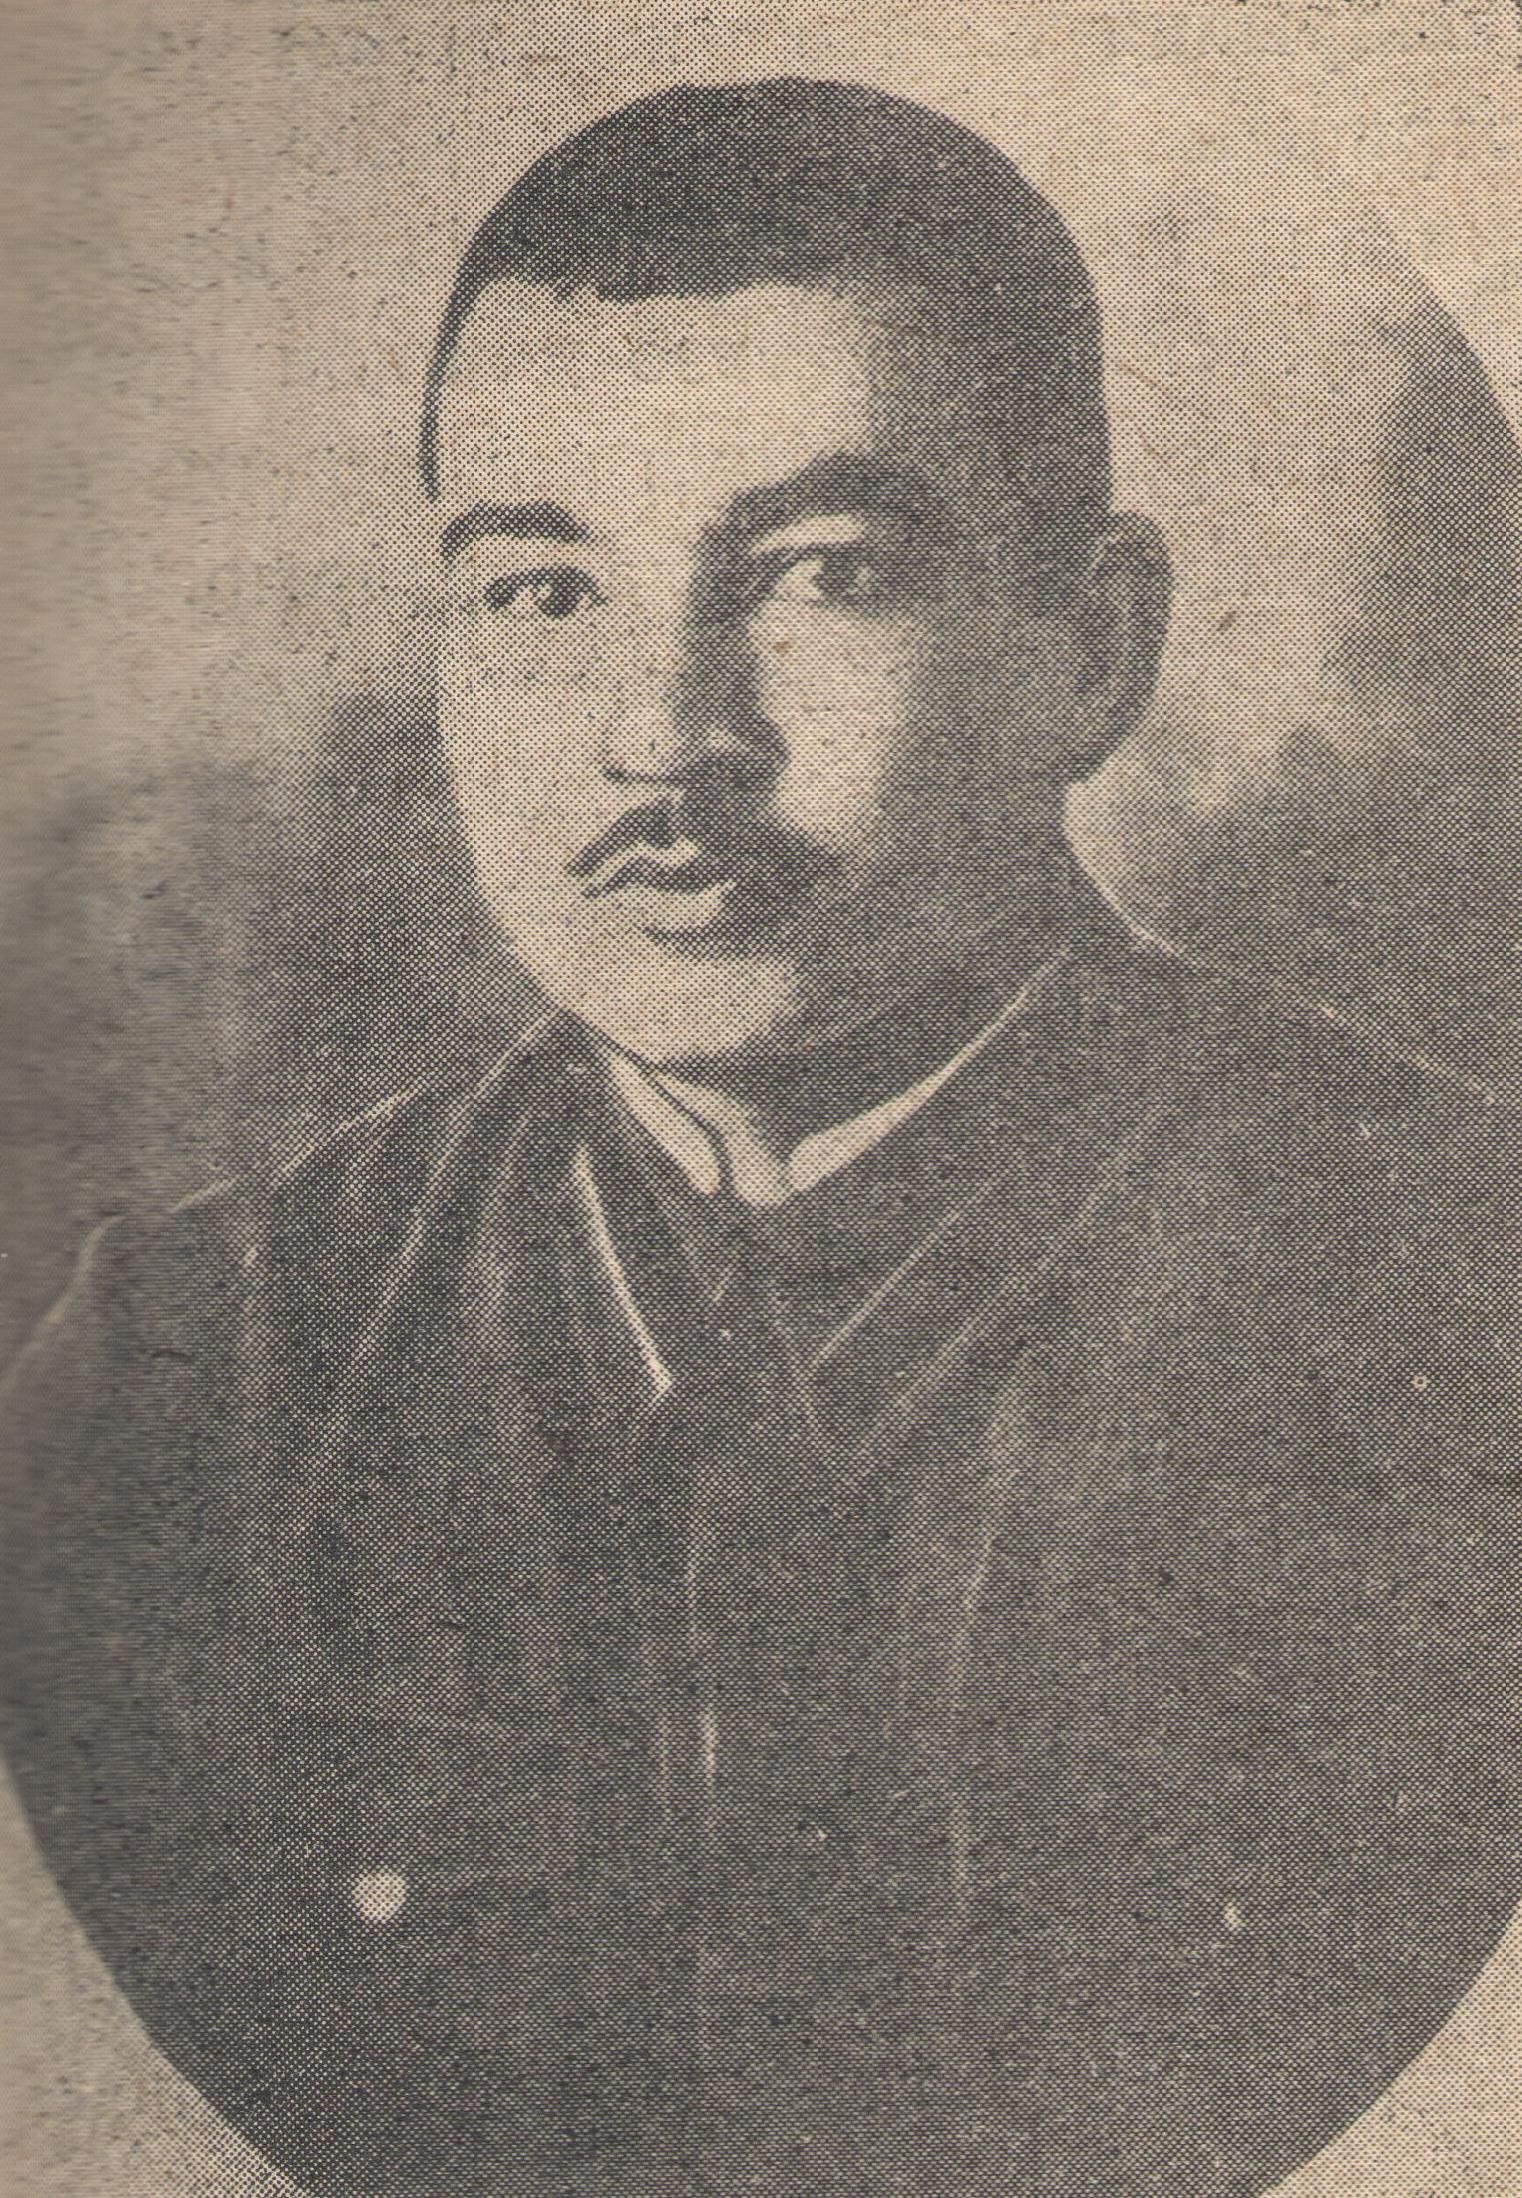 Cross Stitch Alphabet Charts: Mehdi Huseynzade in 1941 in Tbilisi military school.jpeg ,Chart